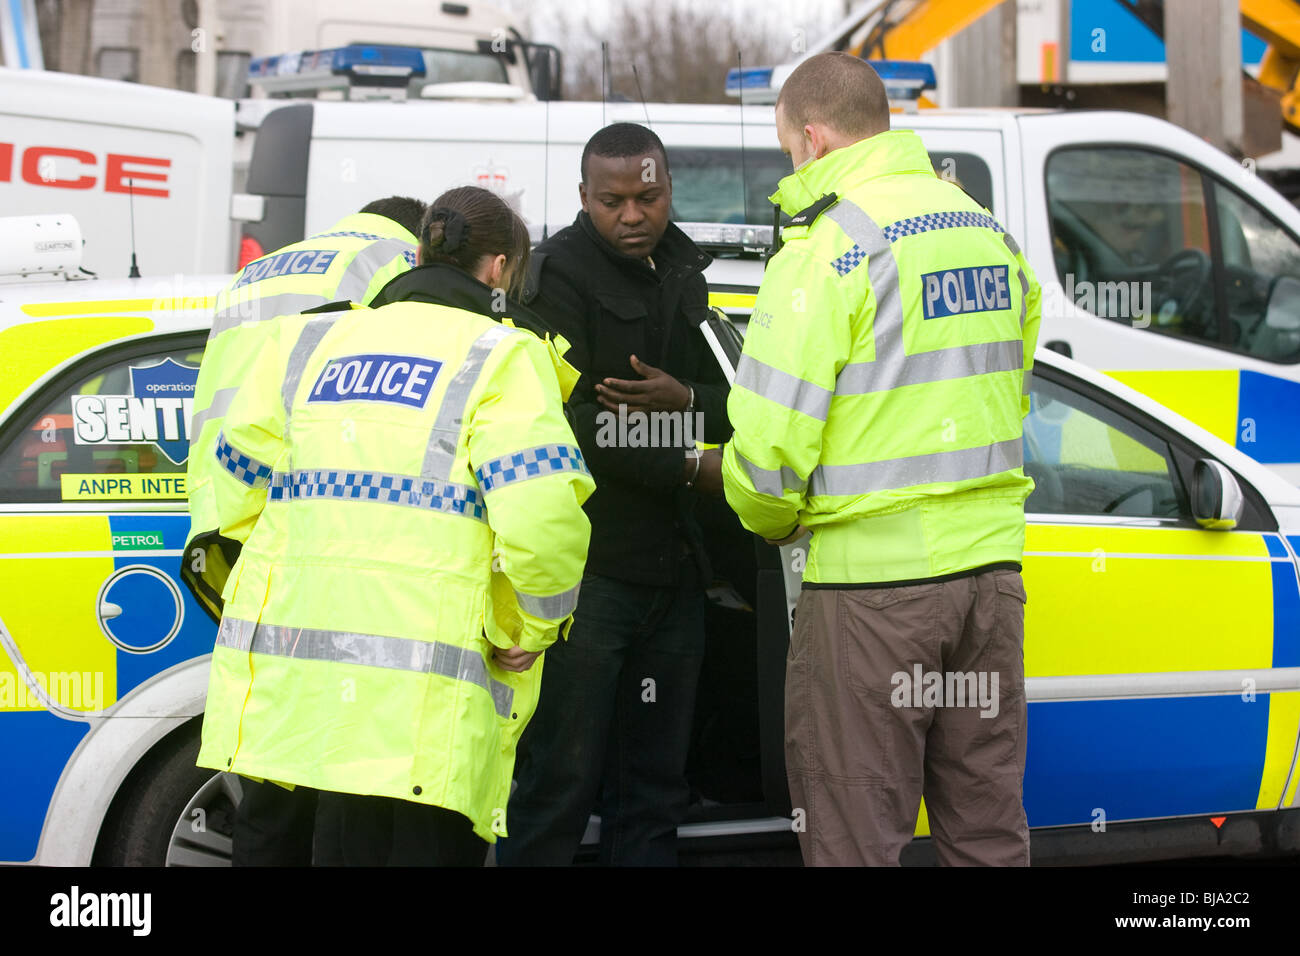 Police make an arrest - Stock Image